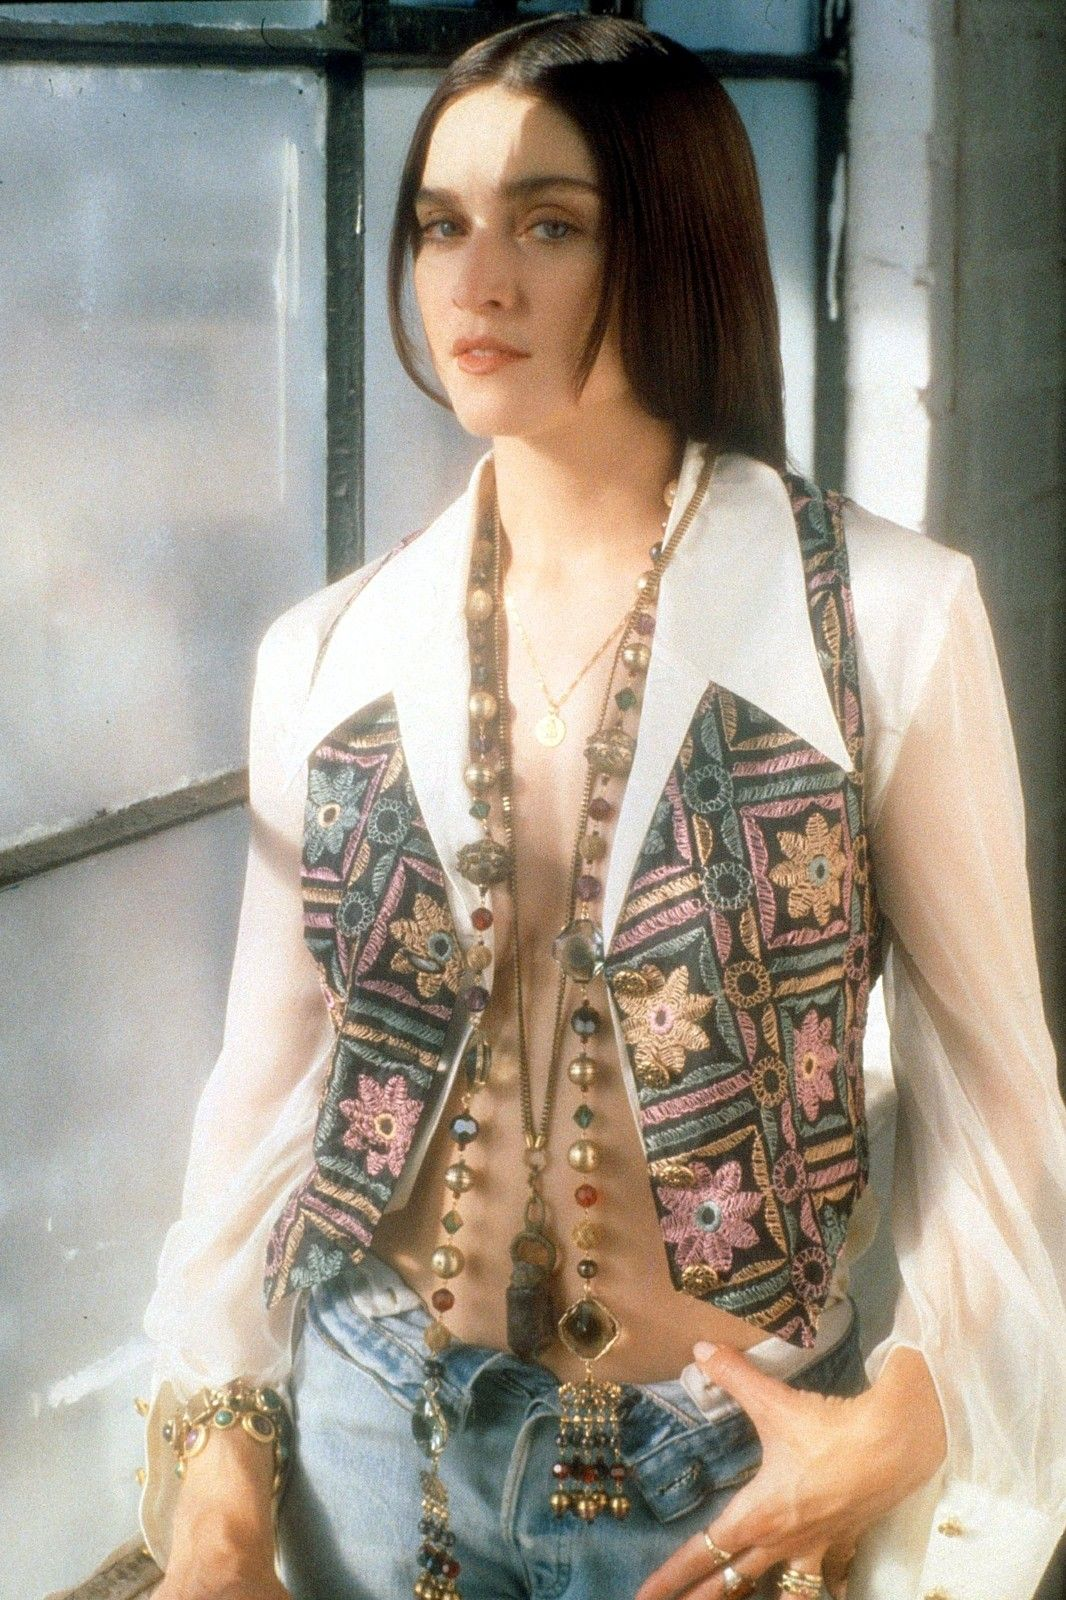 Style Icons 1989 80s Fashion Madonna Princess Diana Lisa Bonet Madonna Style Icons And